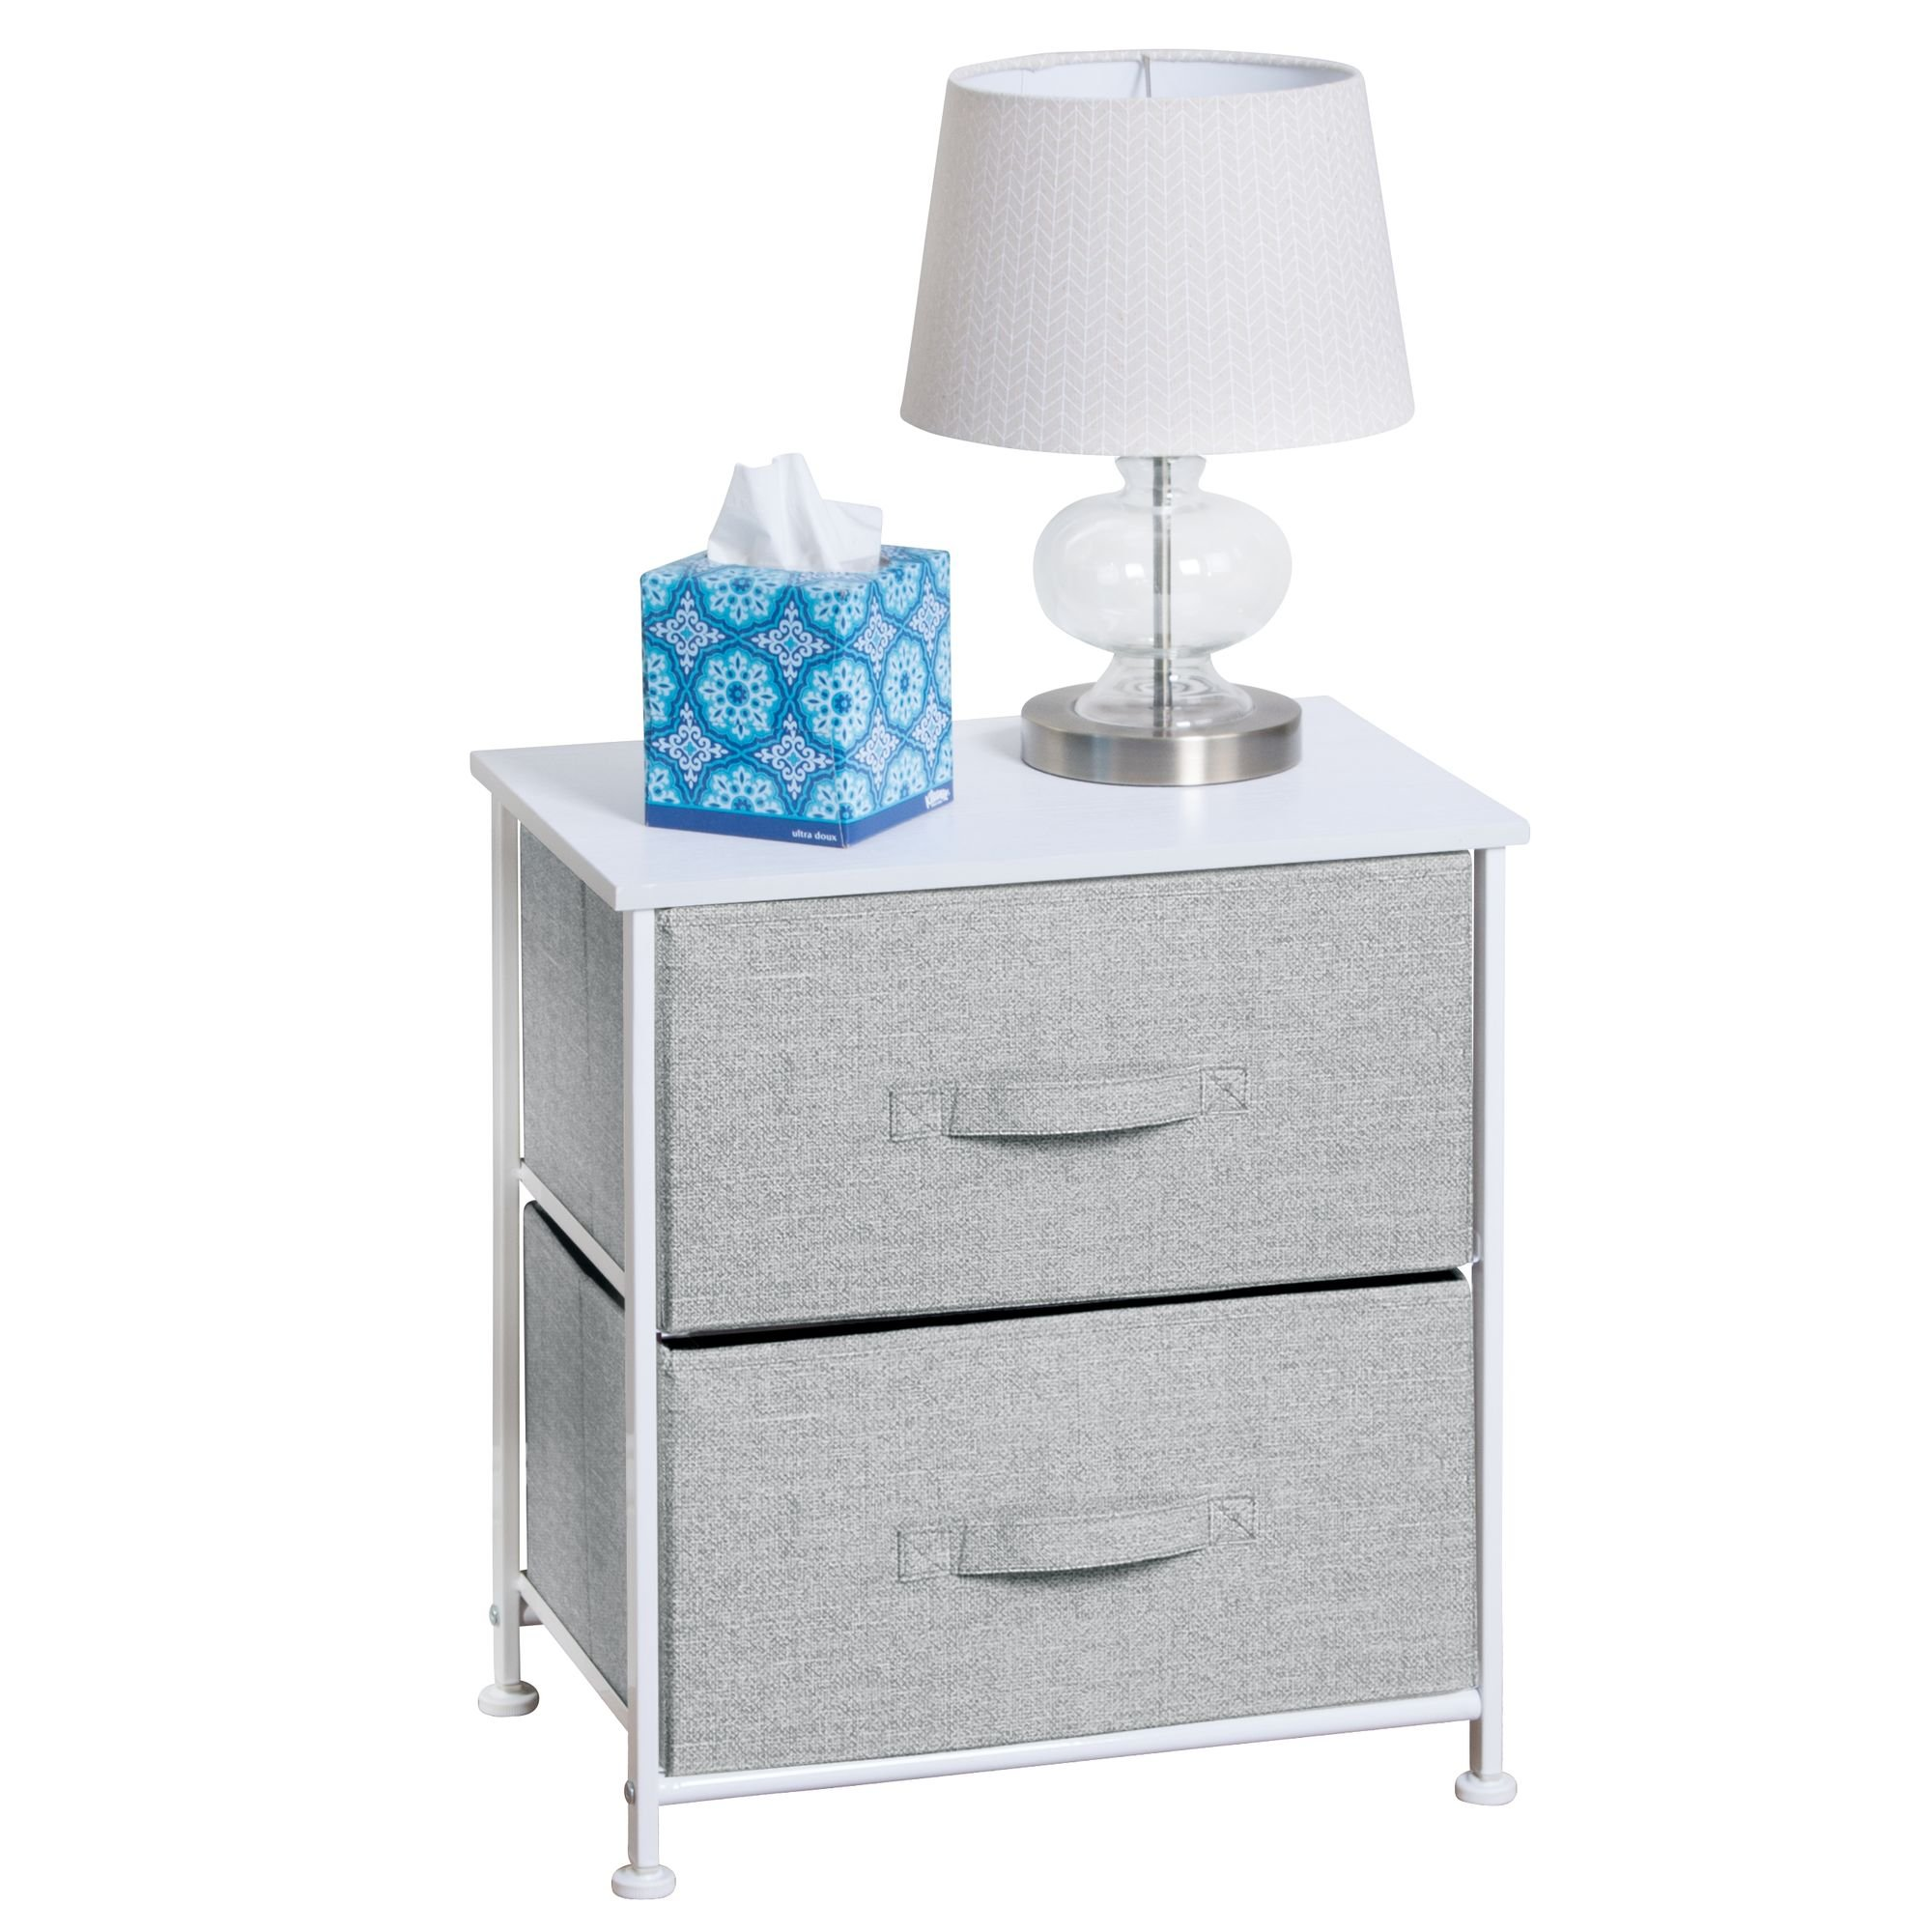 mDesign Fabric 2-Drawer Storage Organizer, Night Stand for Bedroom - Gray